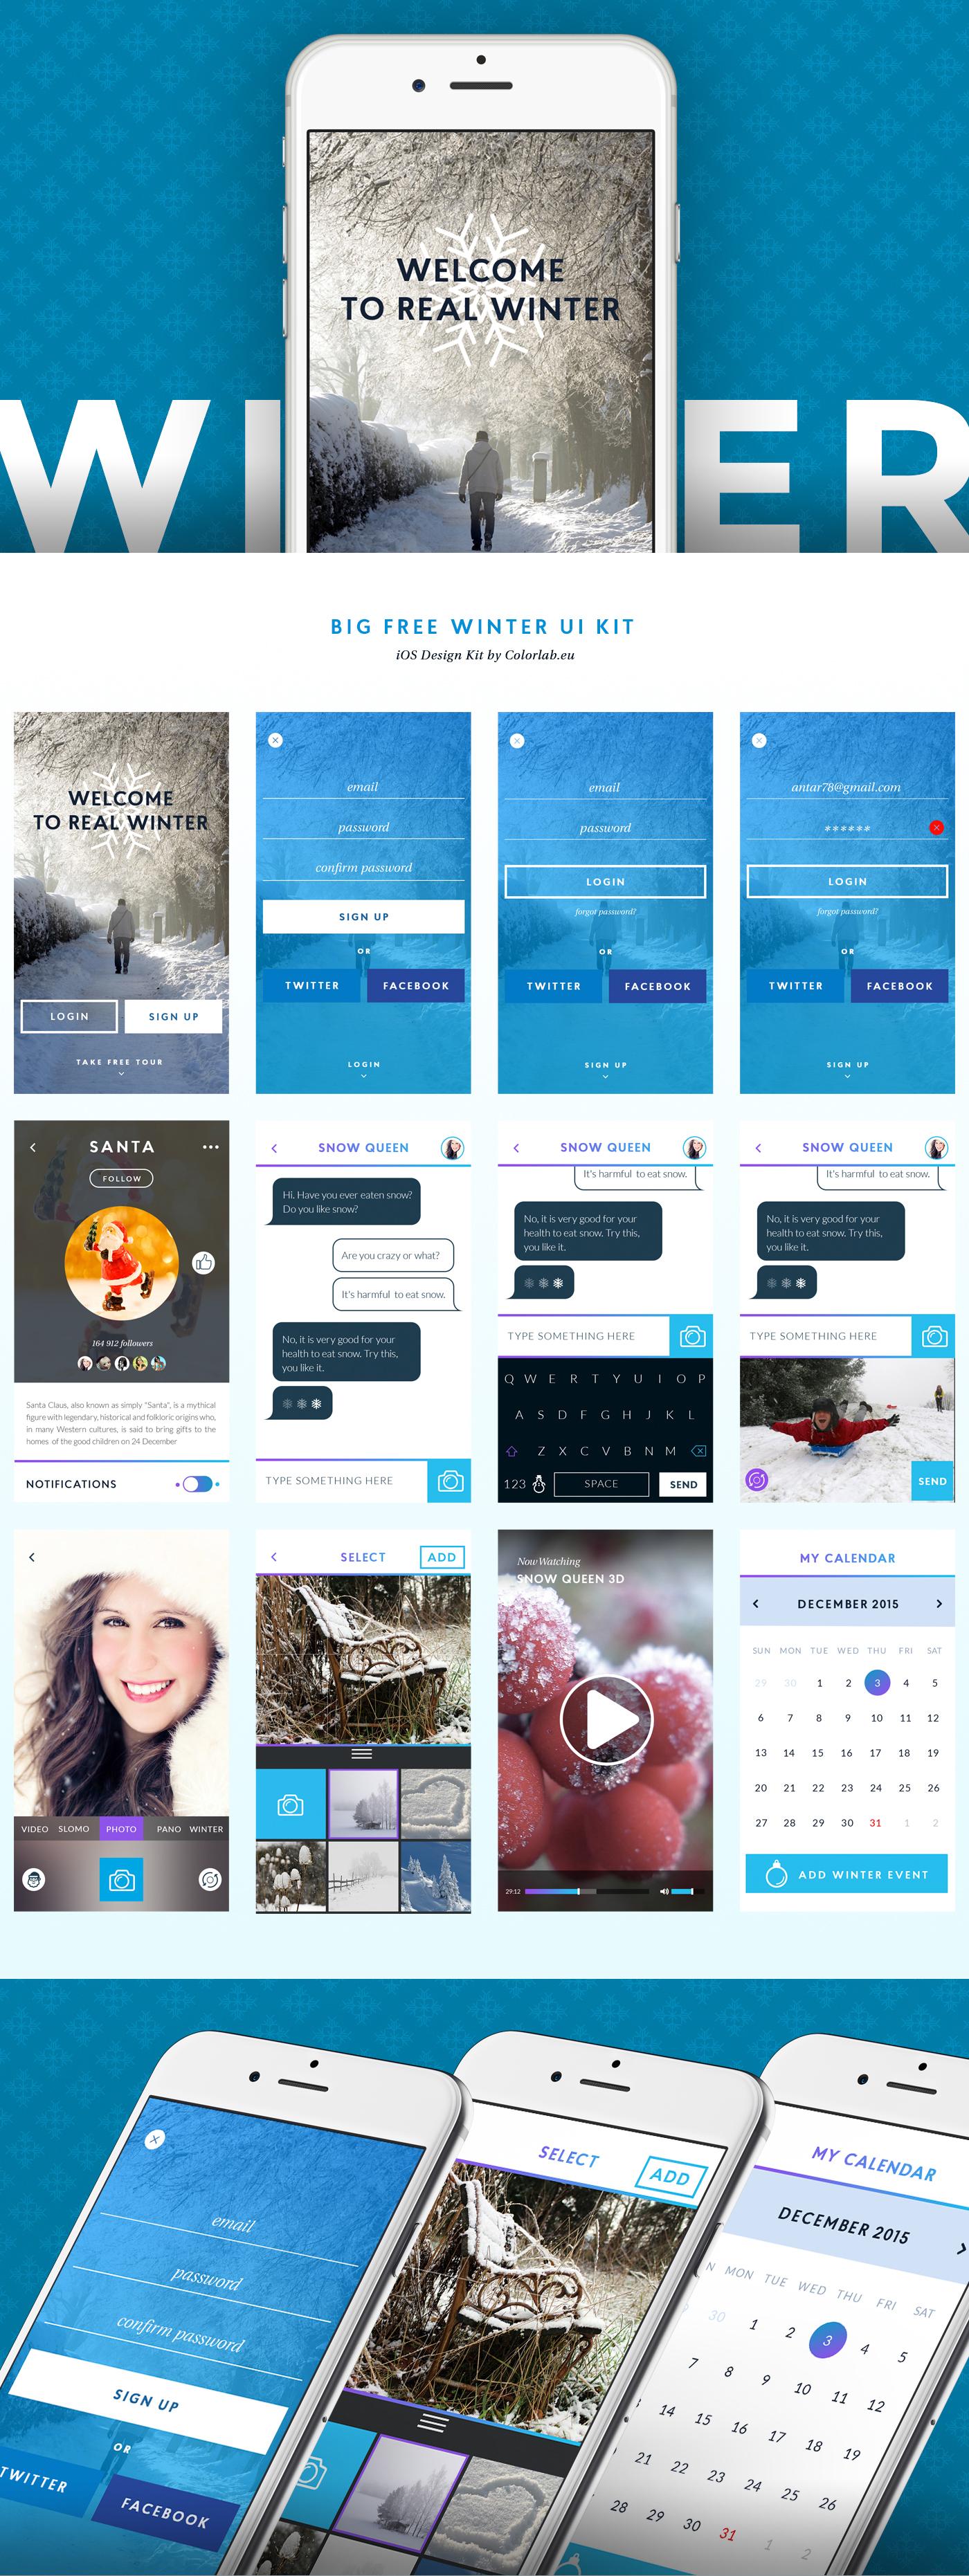 Winter App User Interface Kit Free PSD